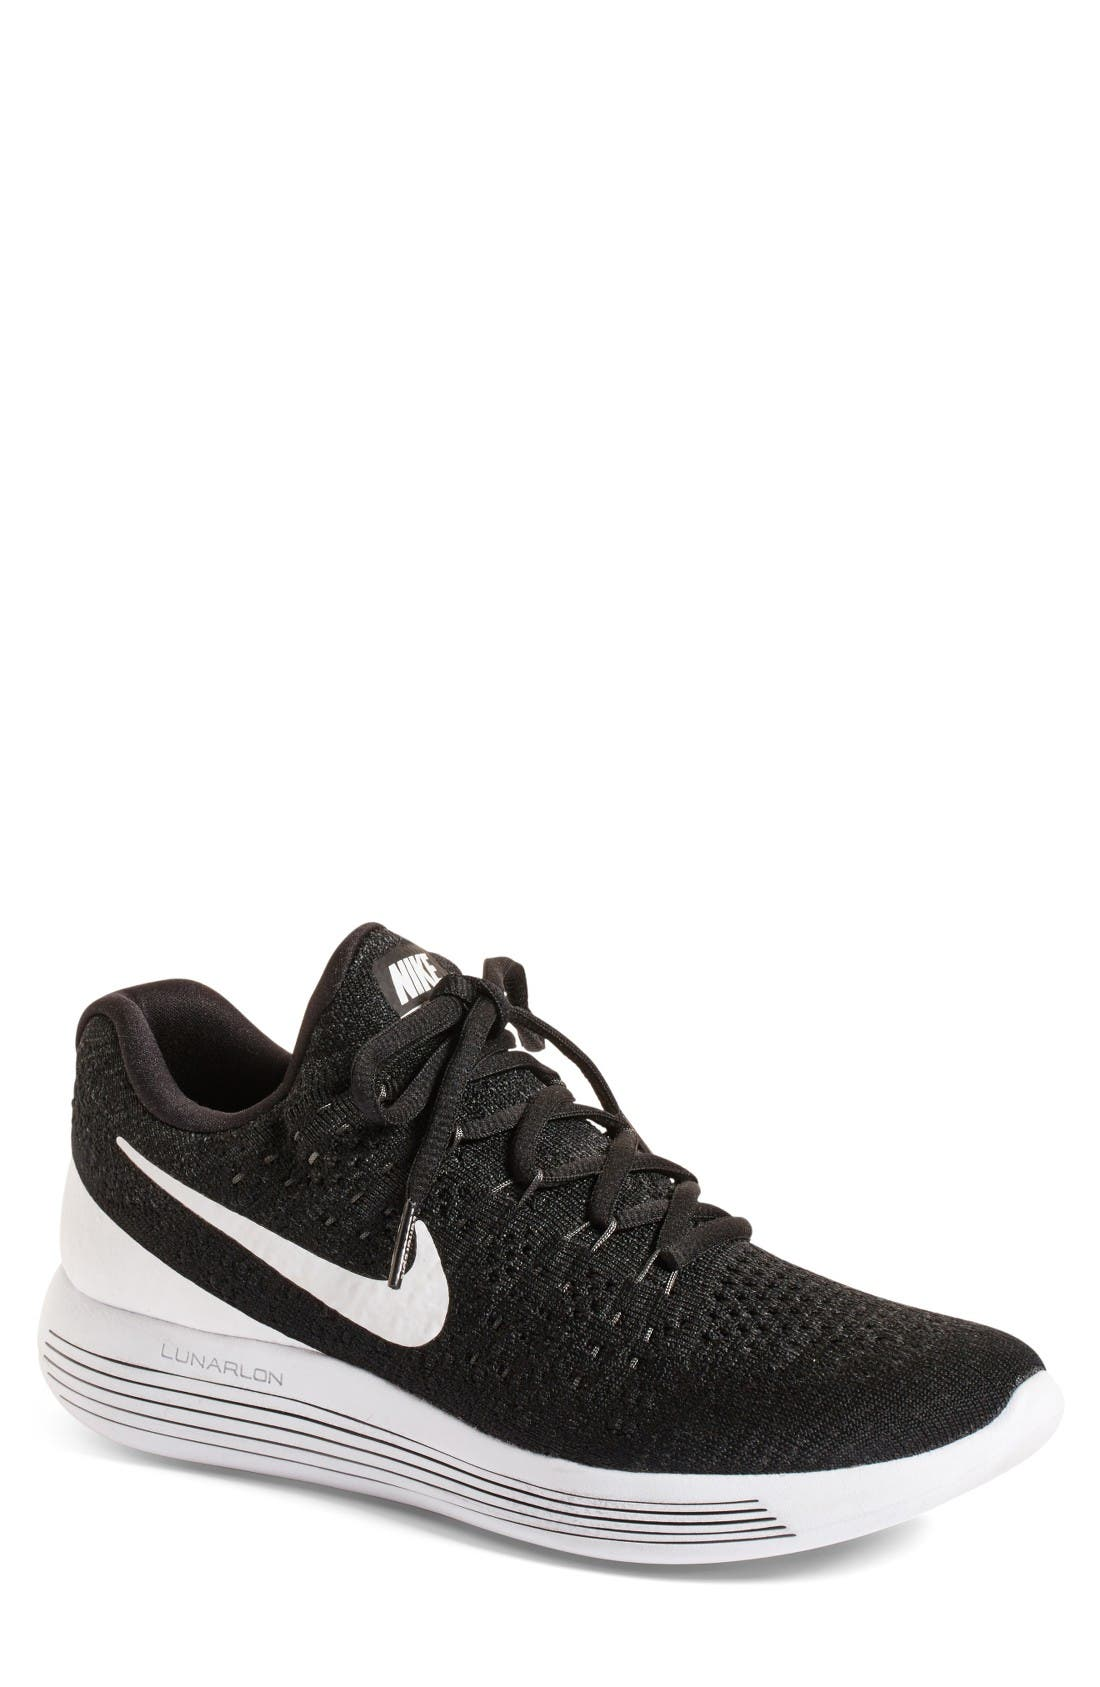 Flyknit 2 LunarEpic Running Shoe,                             Main thumbnail 1, color,                             Black/ White/ Anthracite